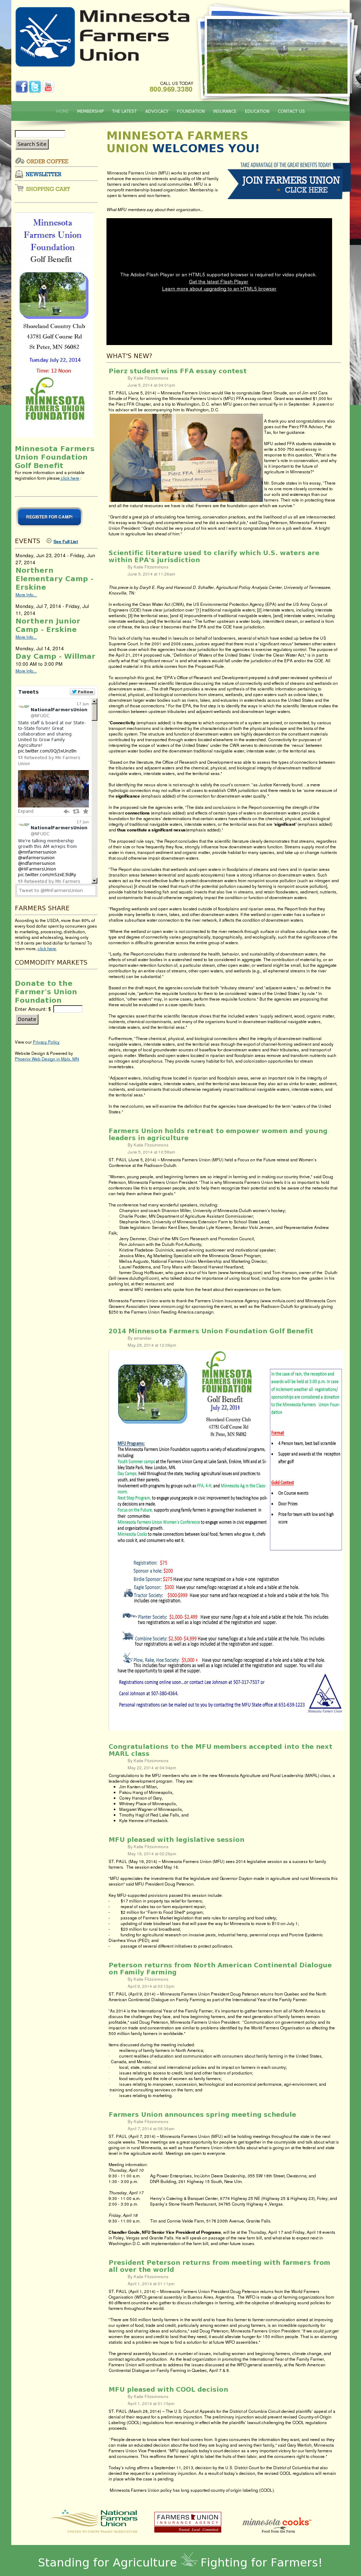 Mfu Competitors, Revenue and Employees - Owler Company Profile